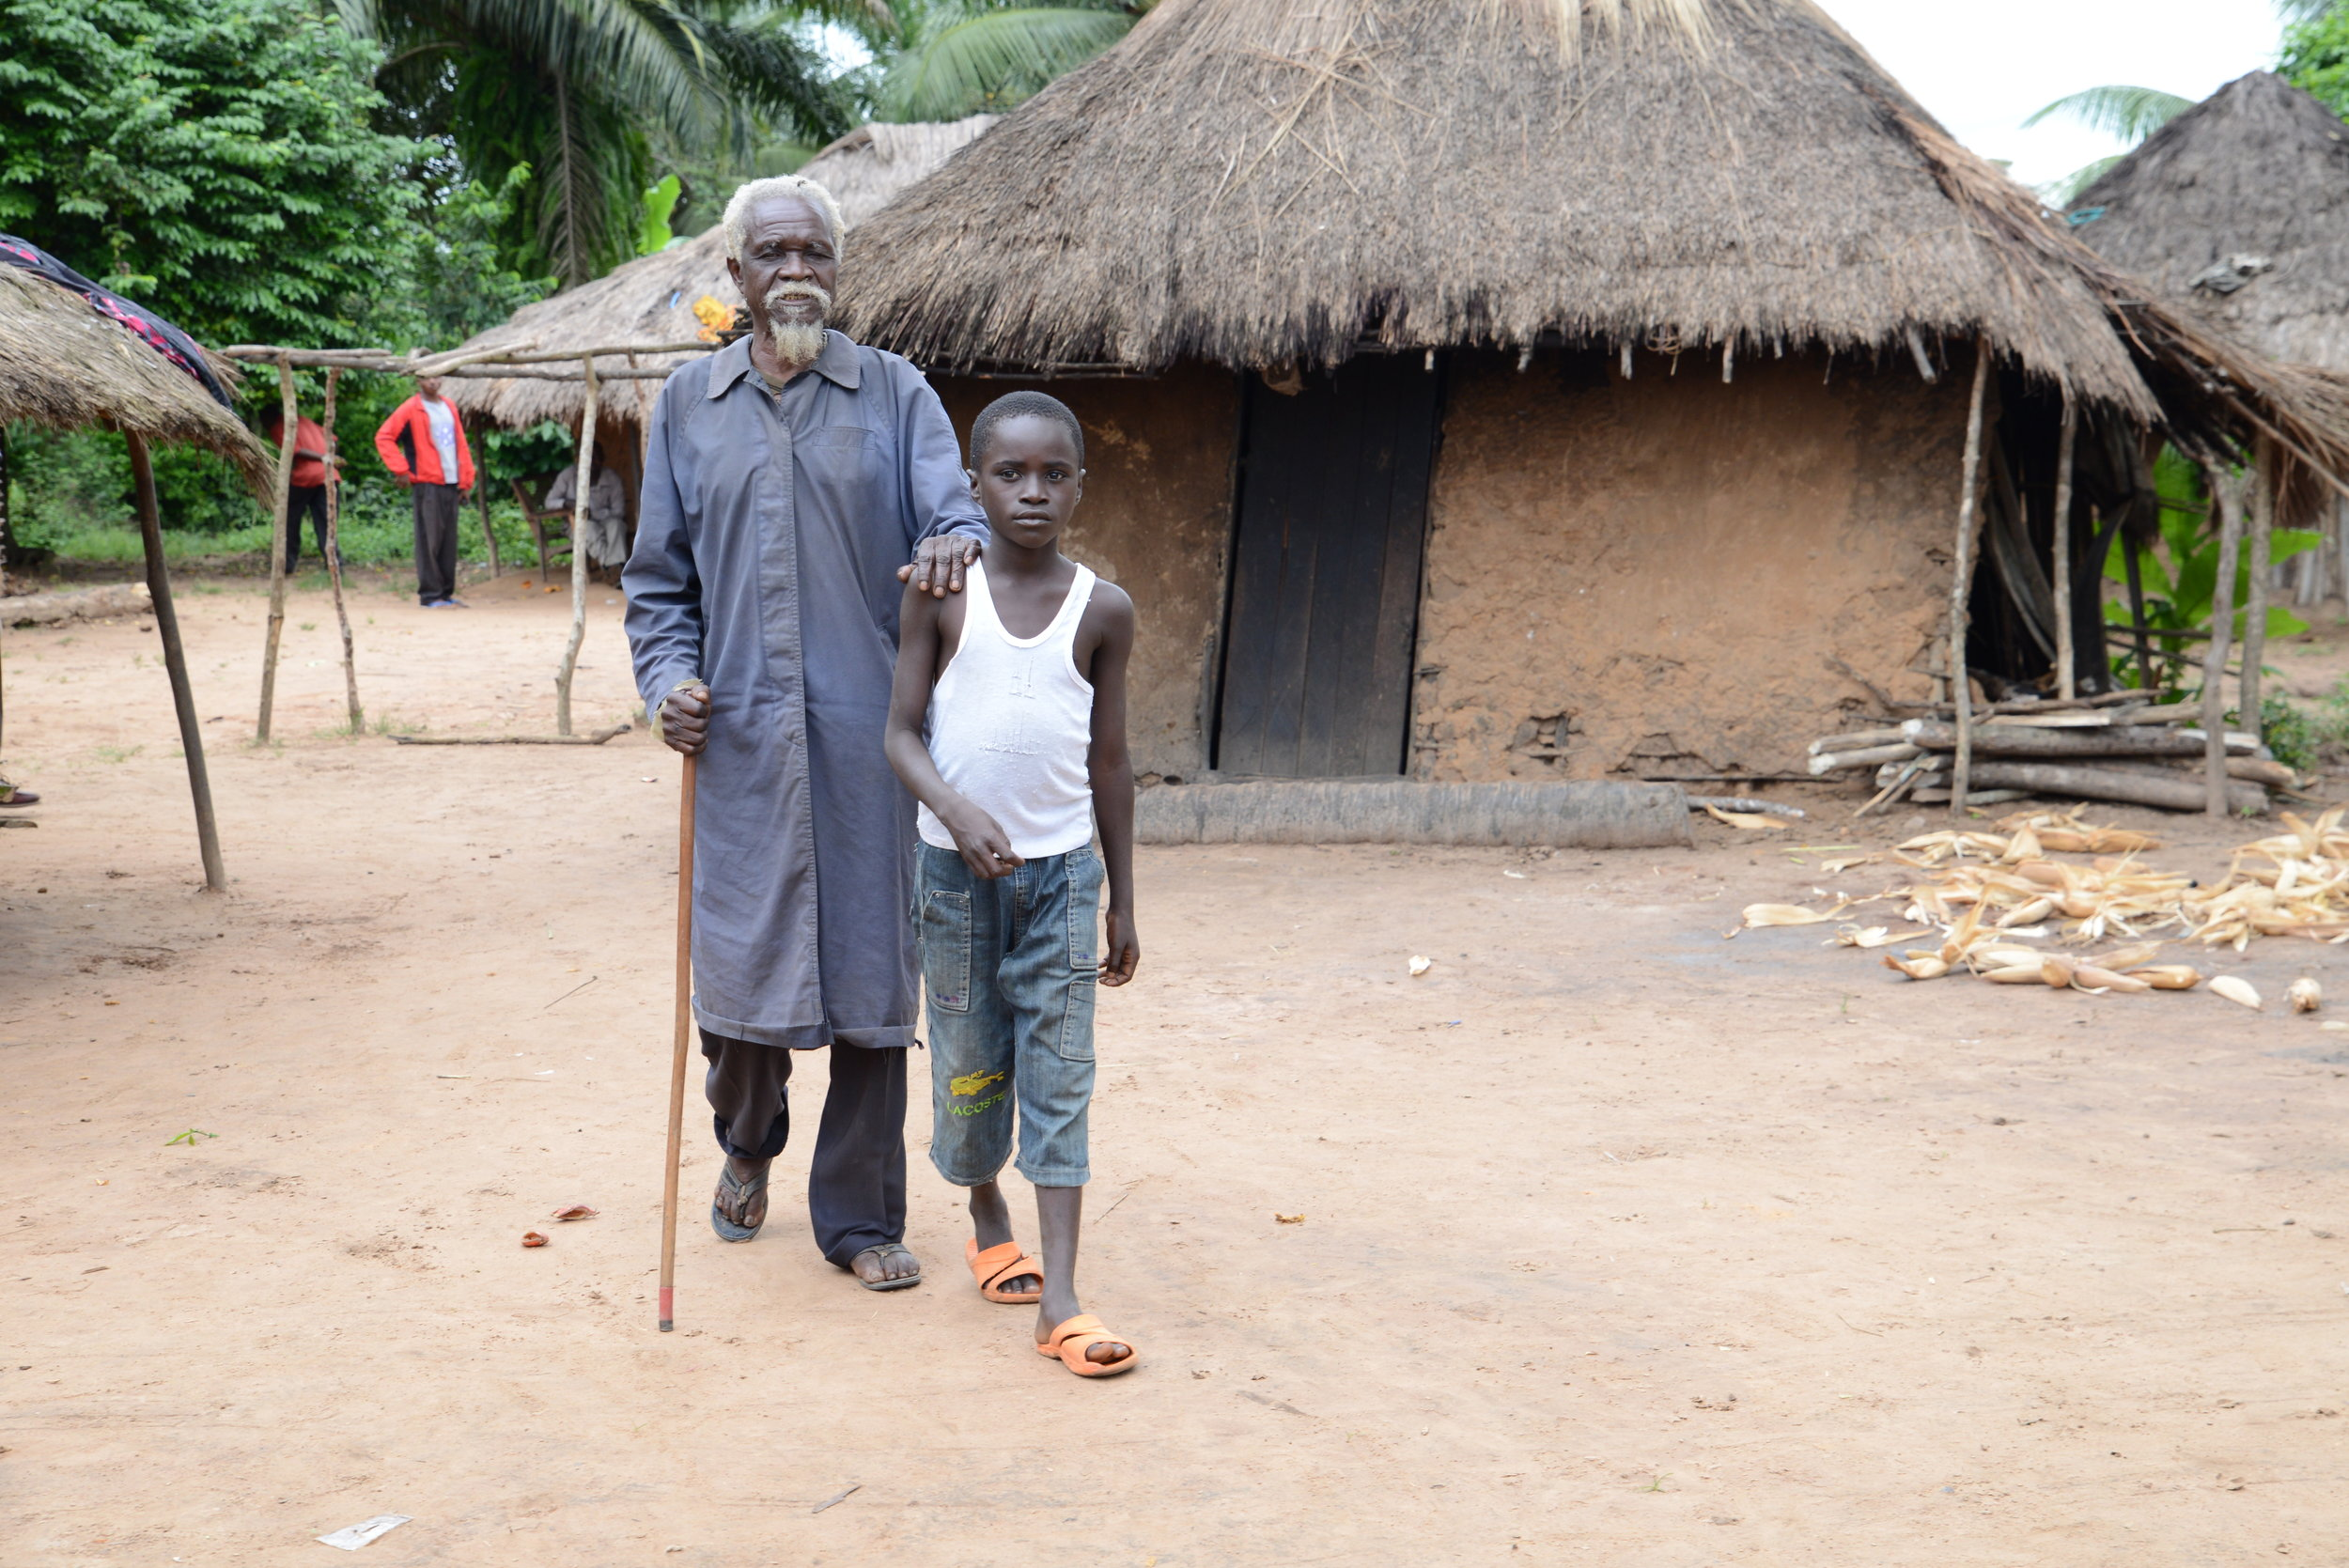 Albert from the Democratic Republic of the Congo